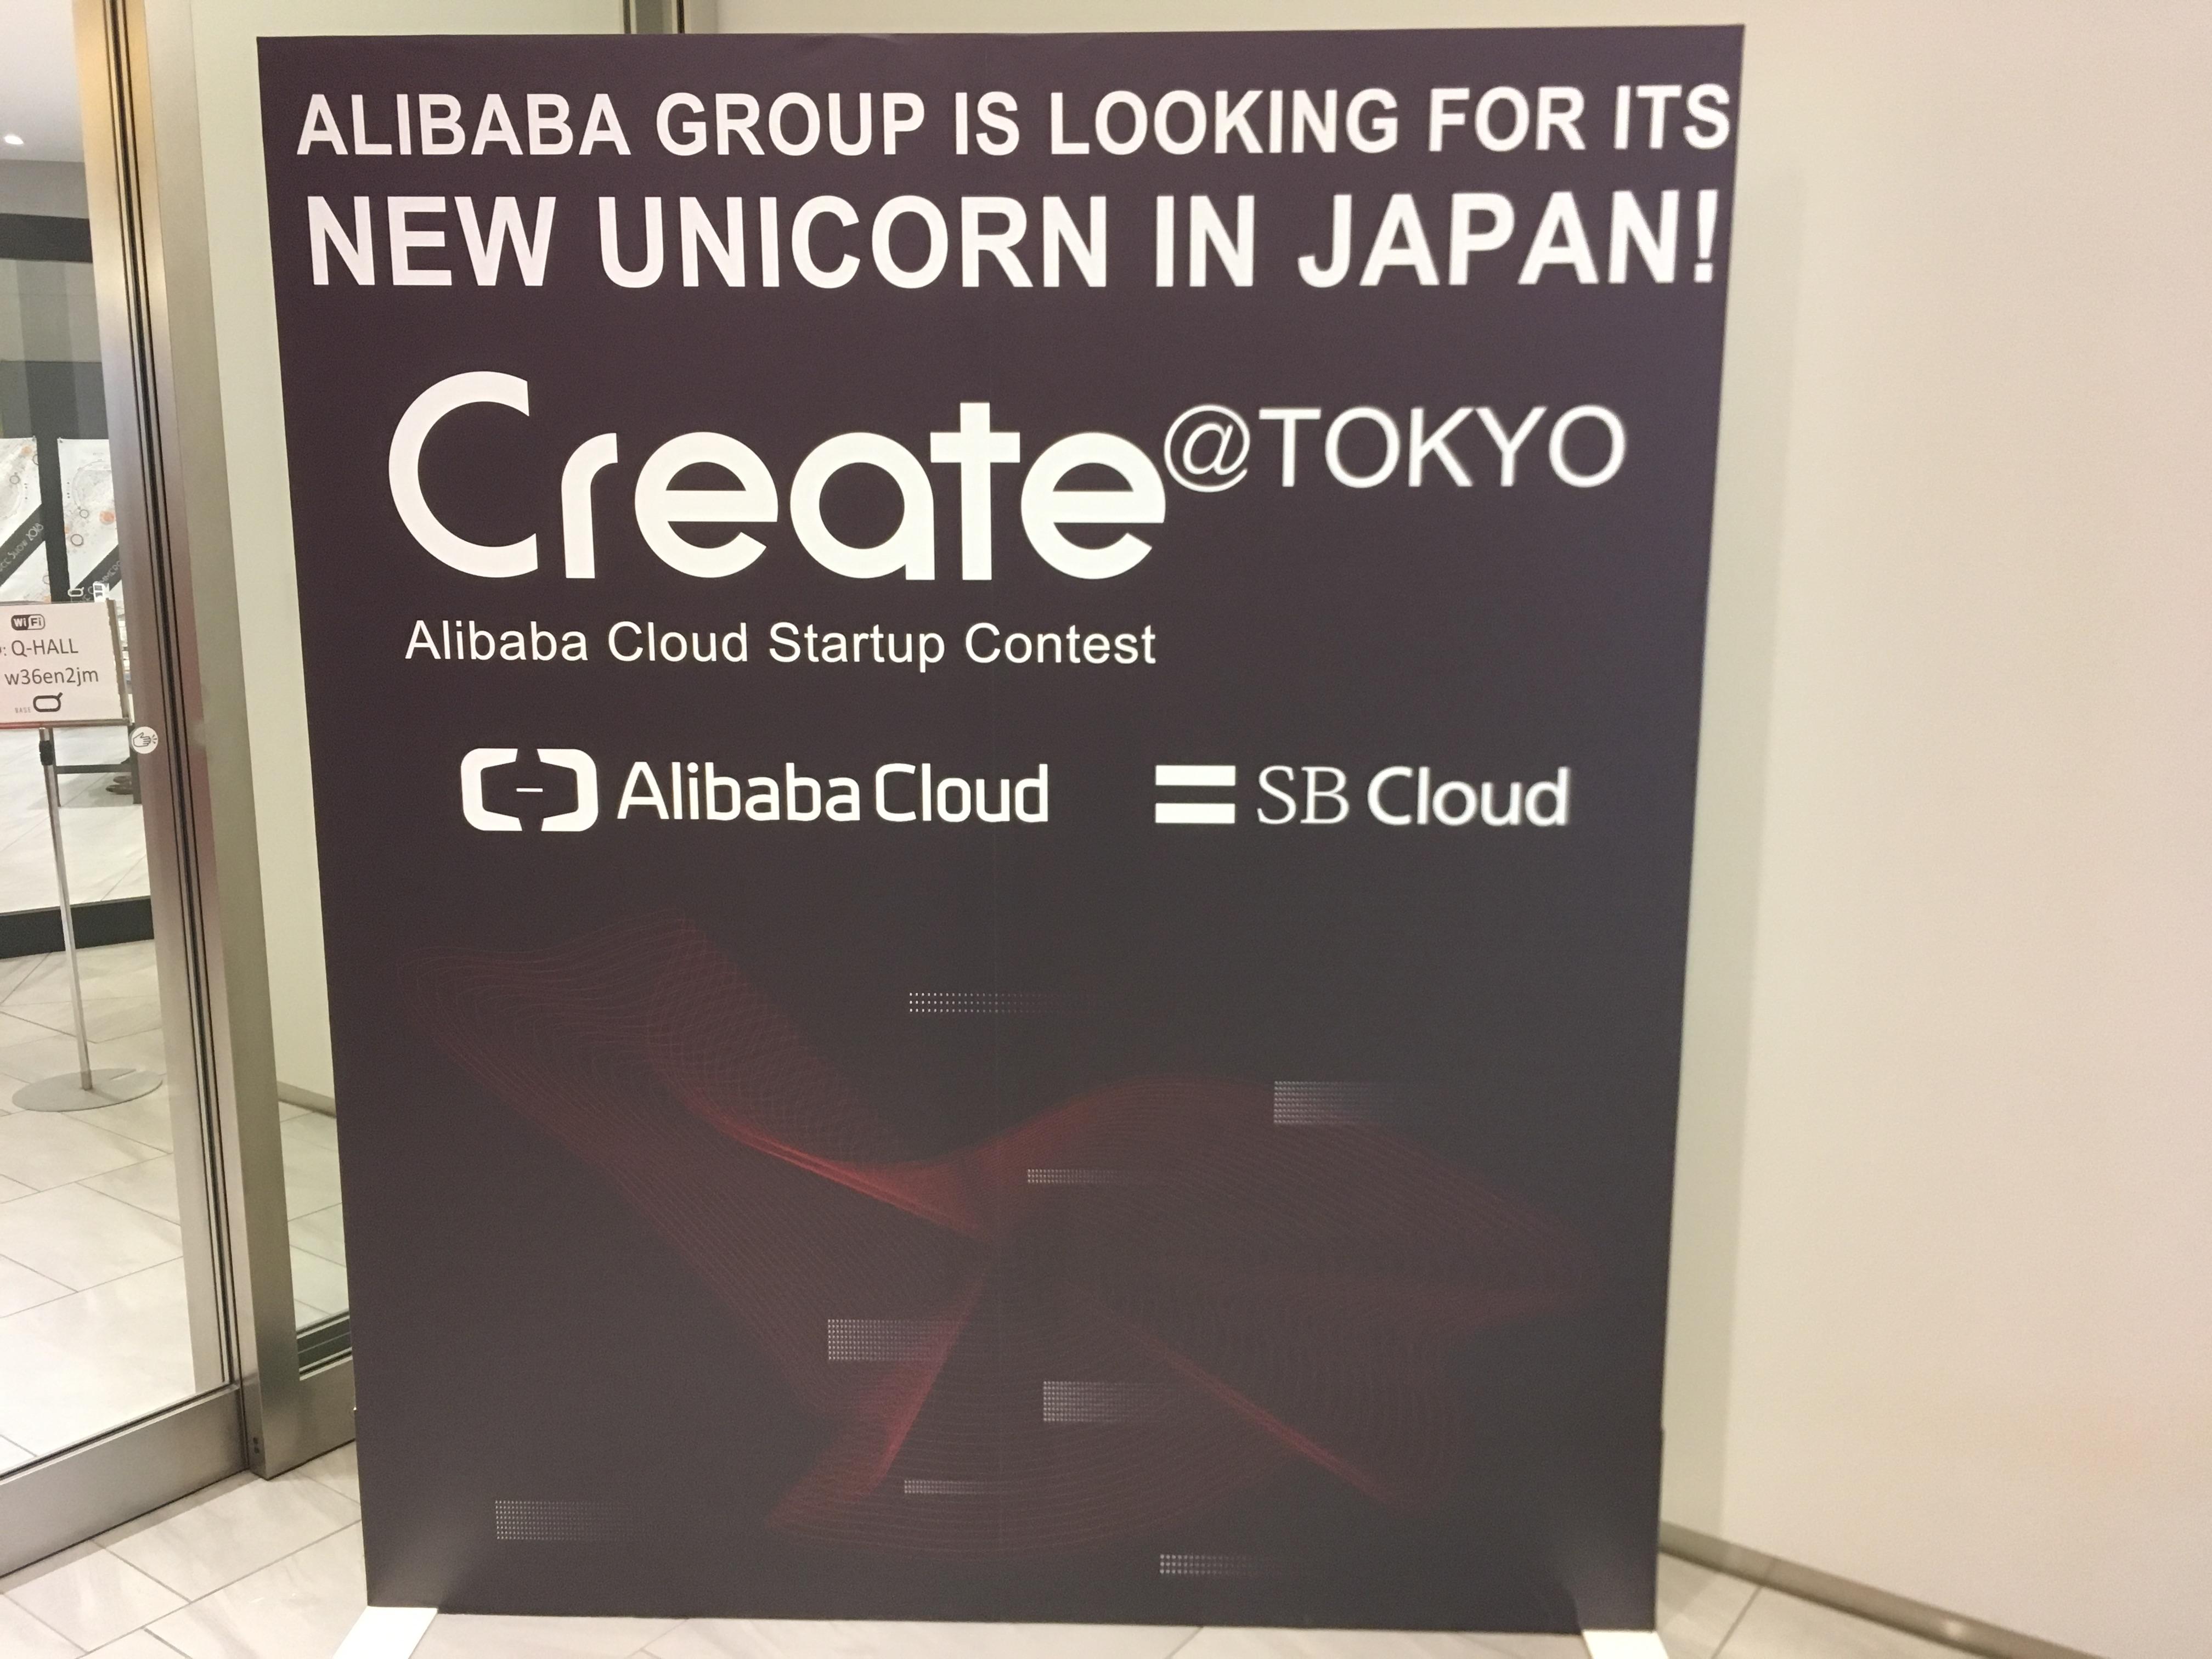 Alibaba Group主催のビジネスコンテストCreate@Tokyoに出展